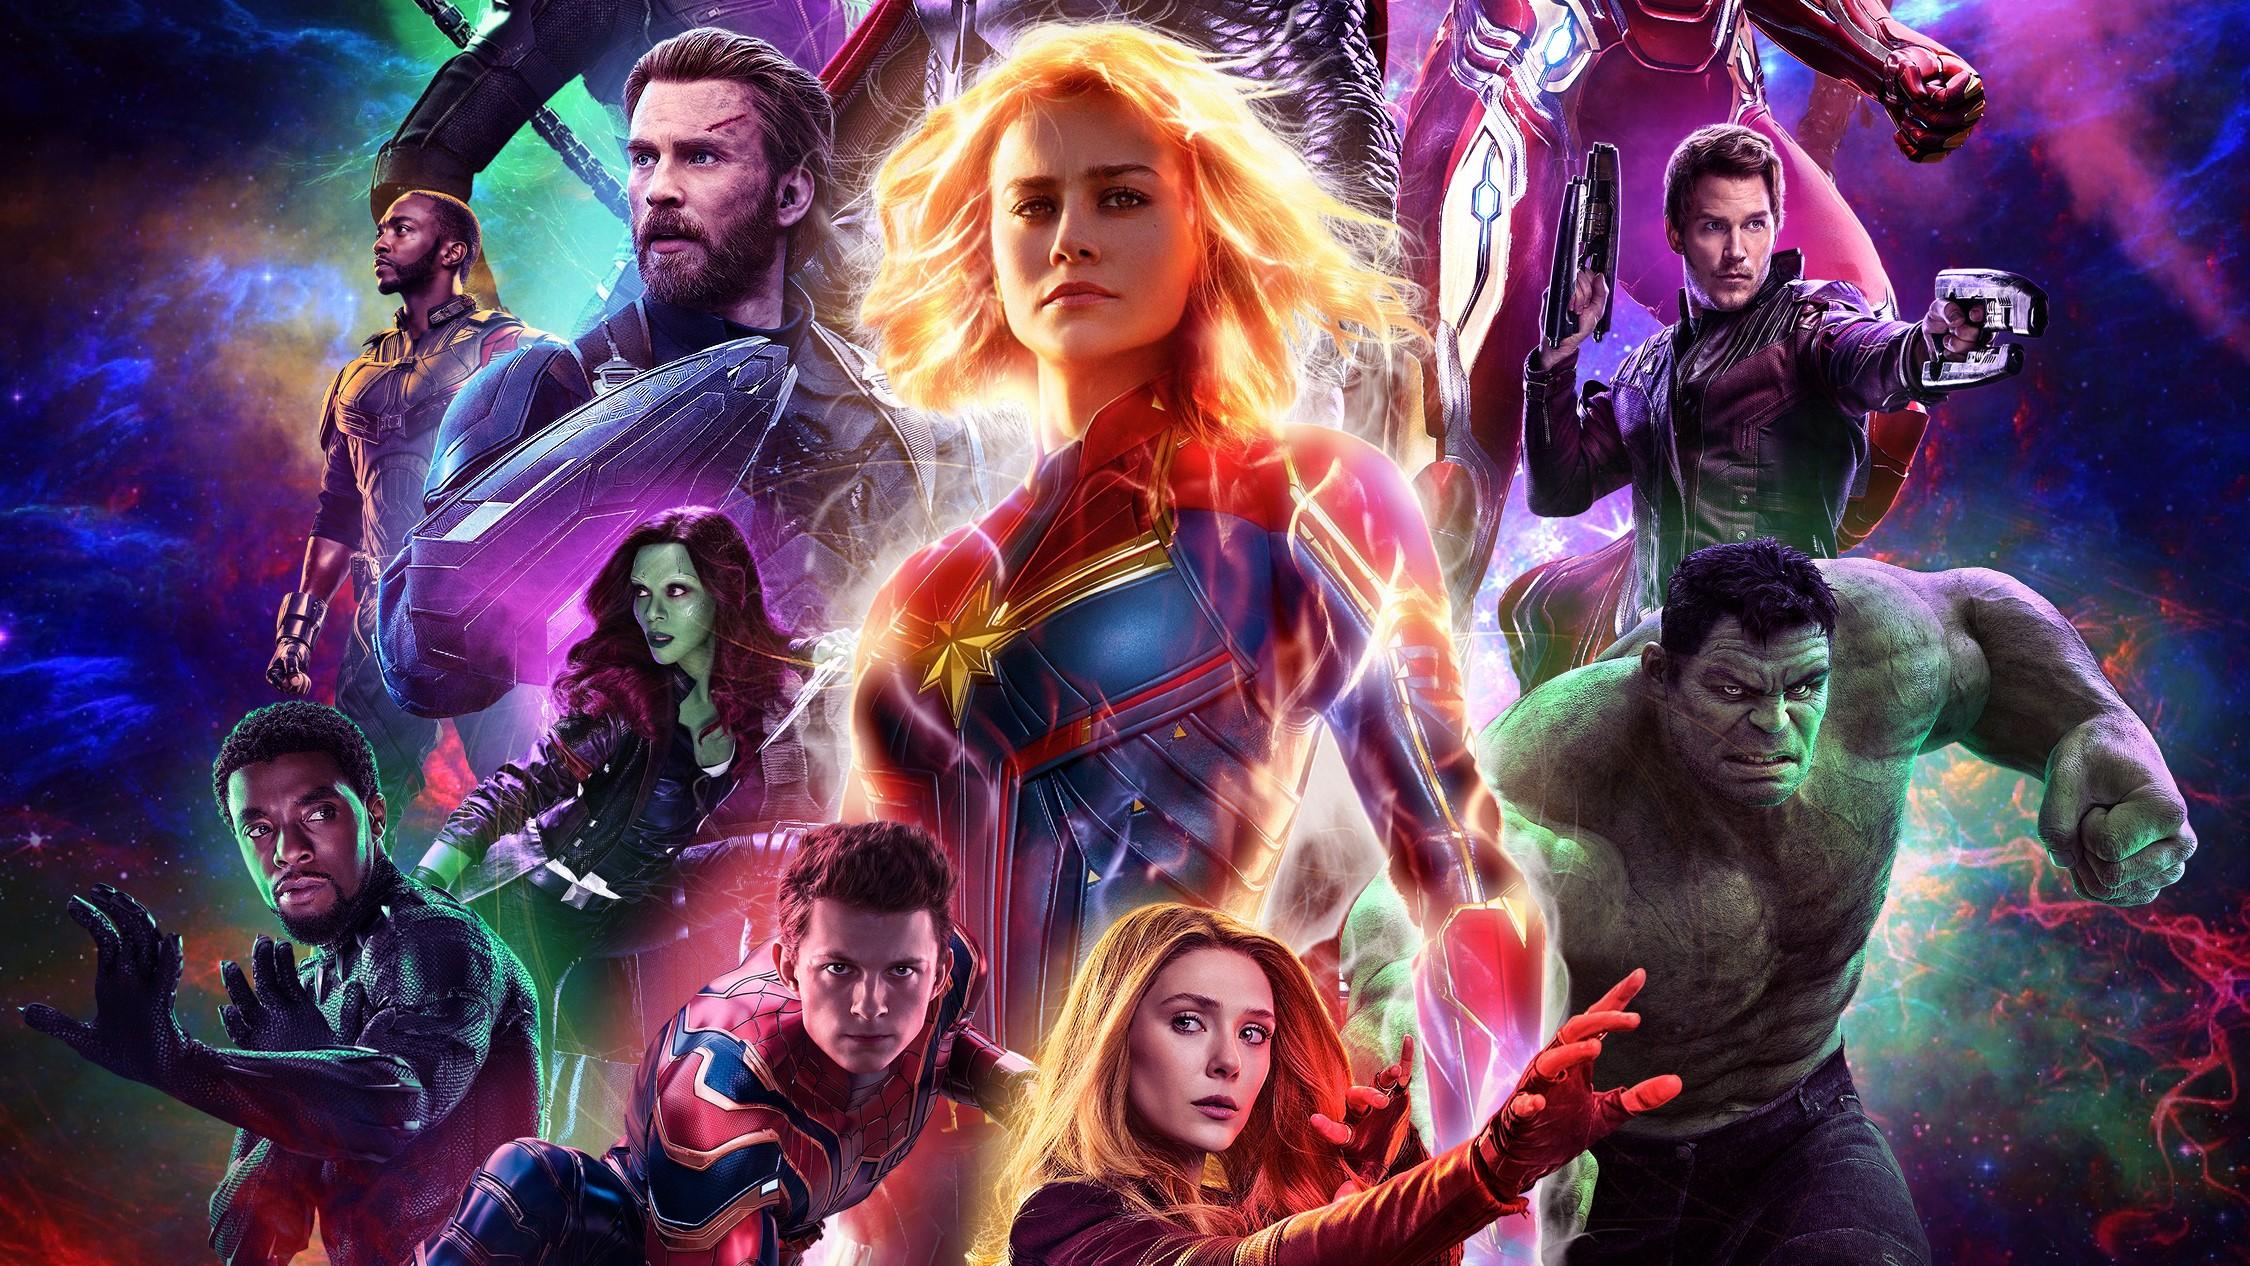 Avengers Endgame hd wallpapers